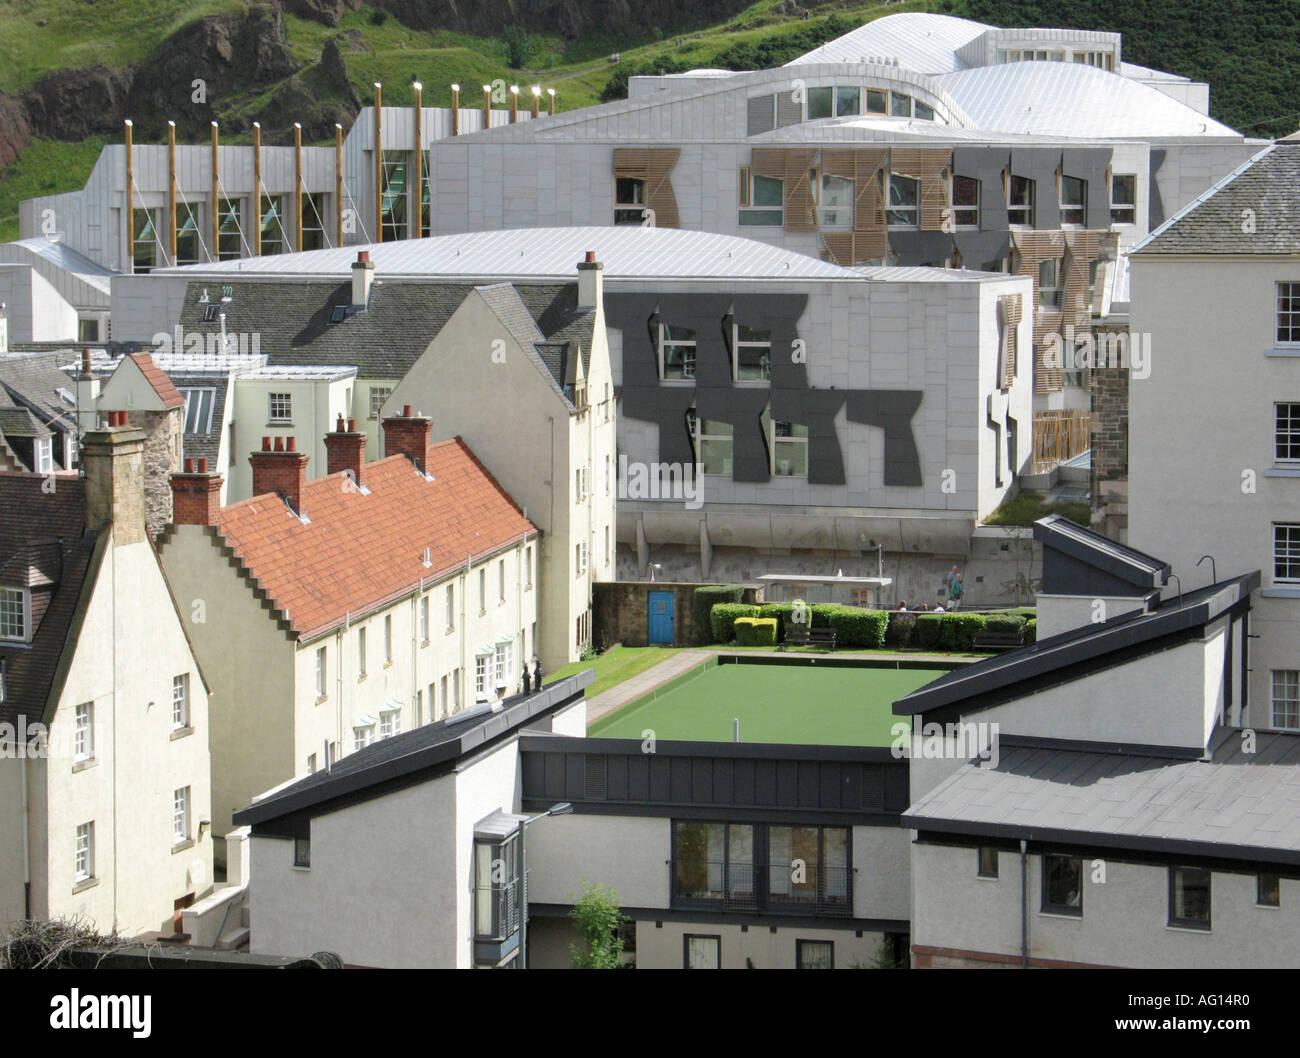 The new Scottish Parliament complex seen from New Calton Hill Burial Ground, Edinburgh, Scotland, UK. Stock Photo